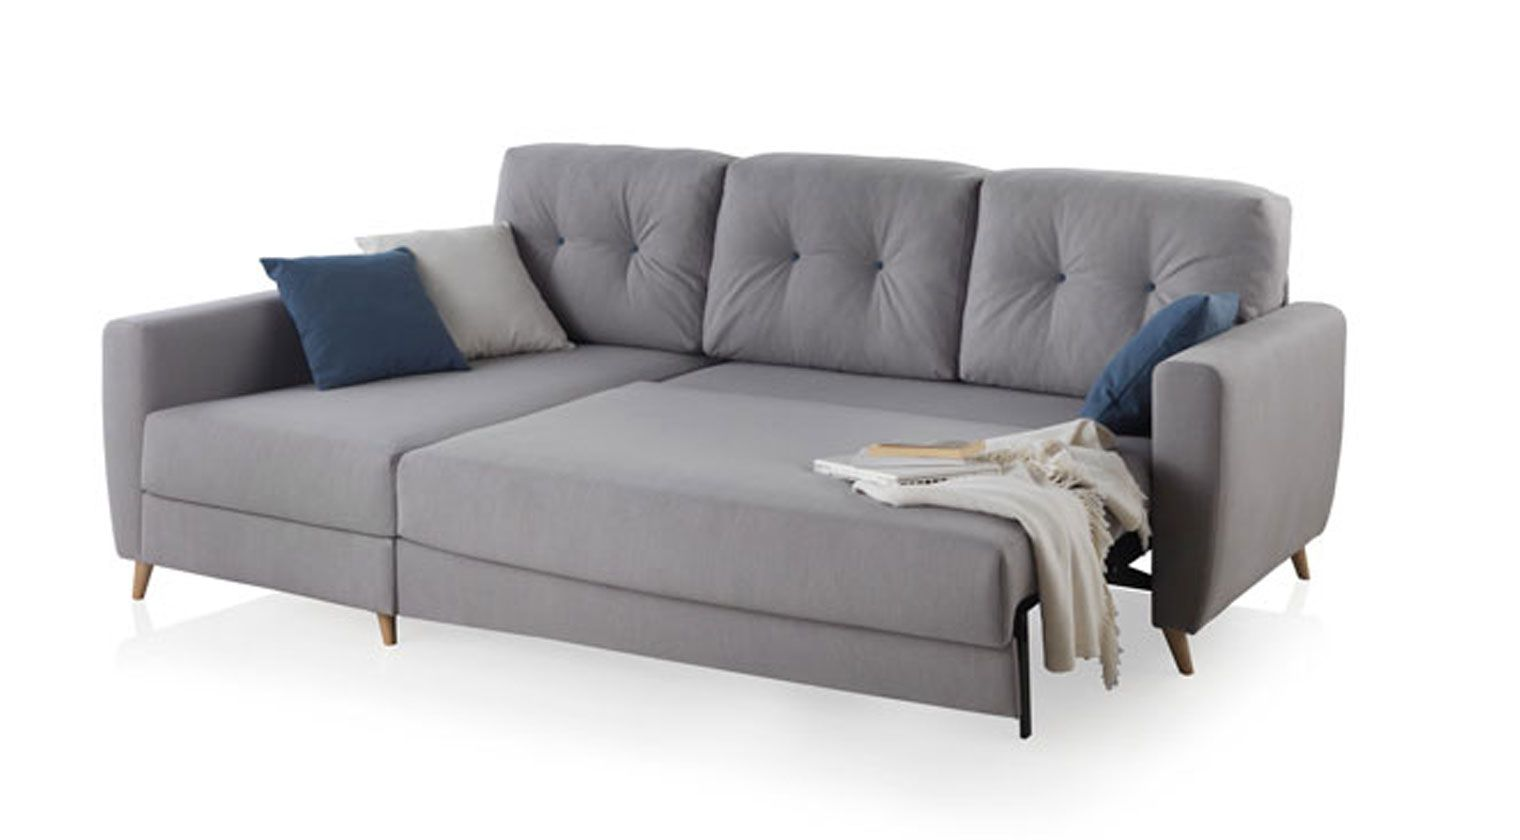 b4bb985482f Chaise Longue Cama BARCELONA .Sofas cama Extensible - Nido